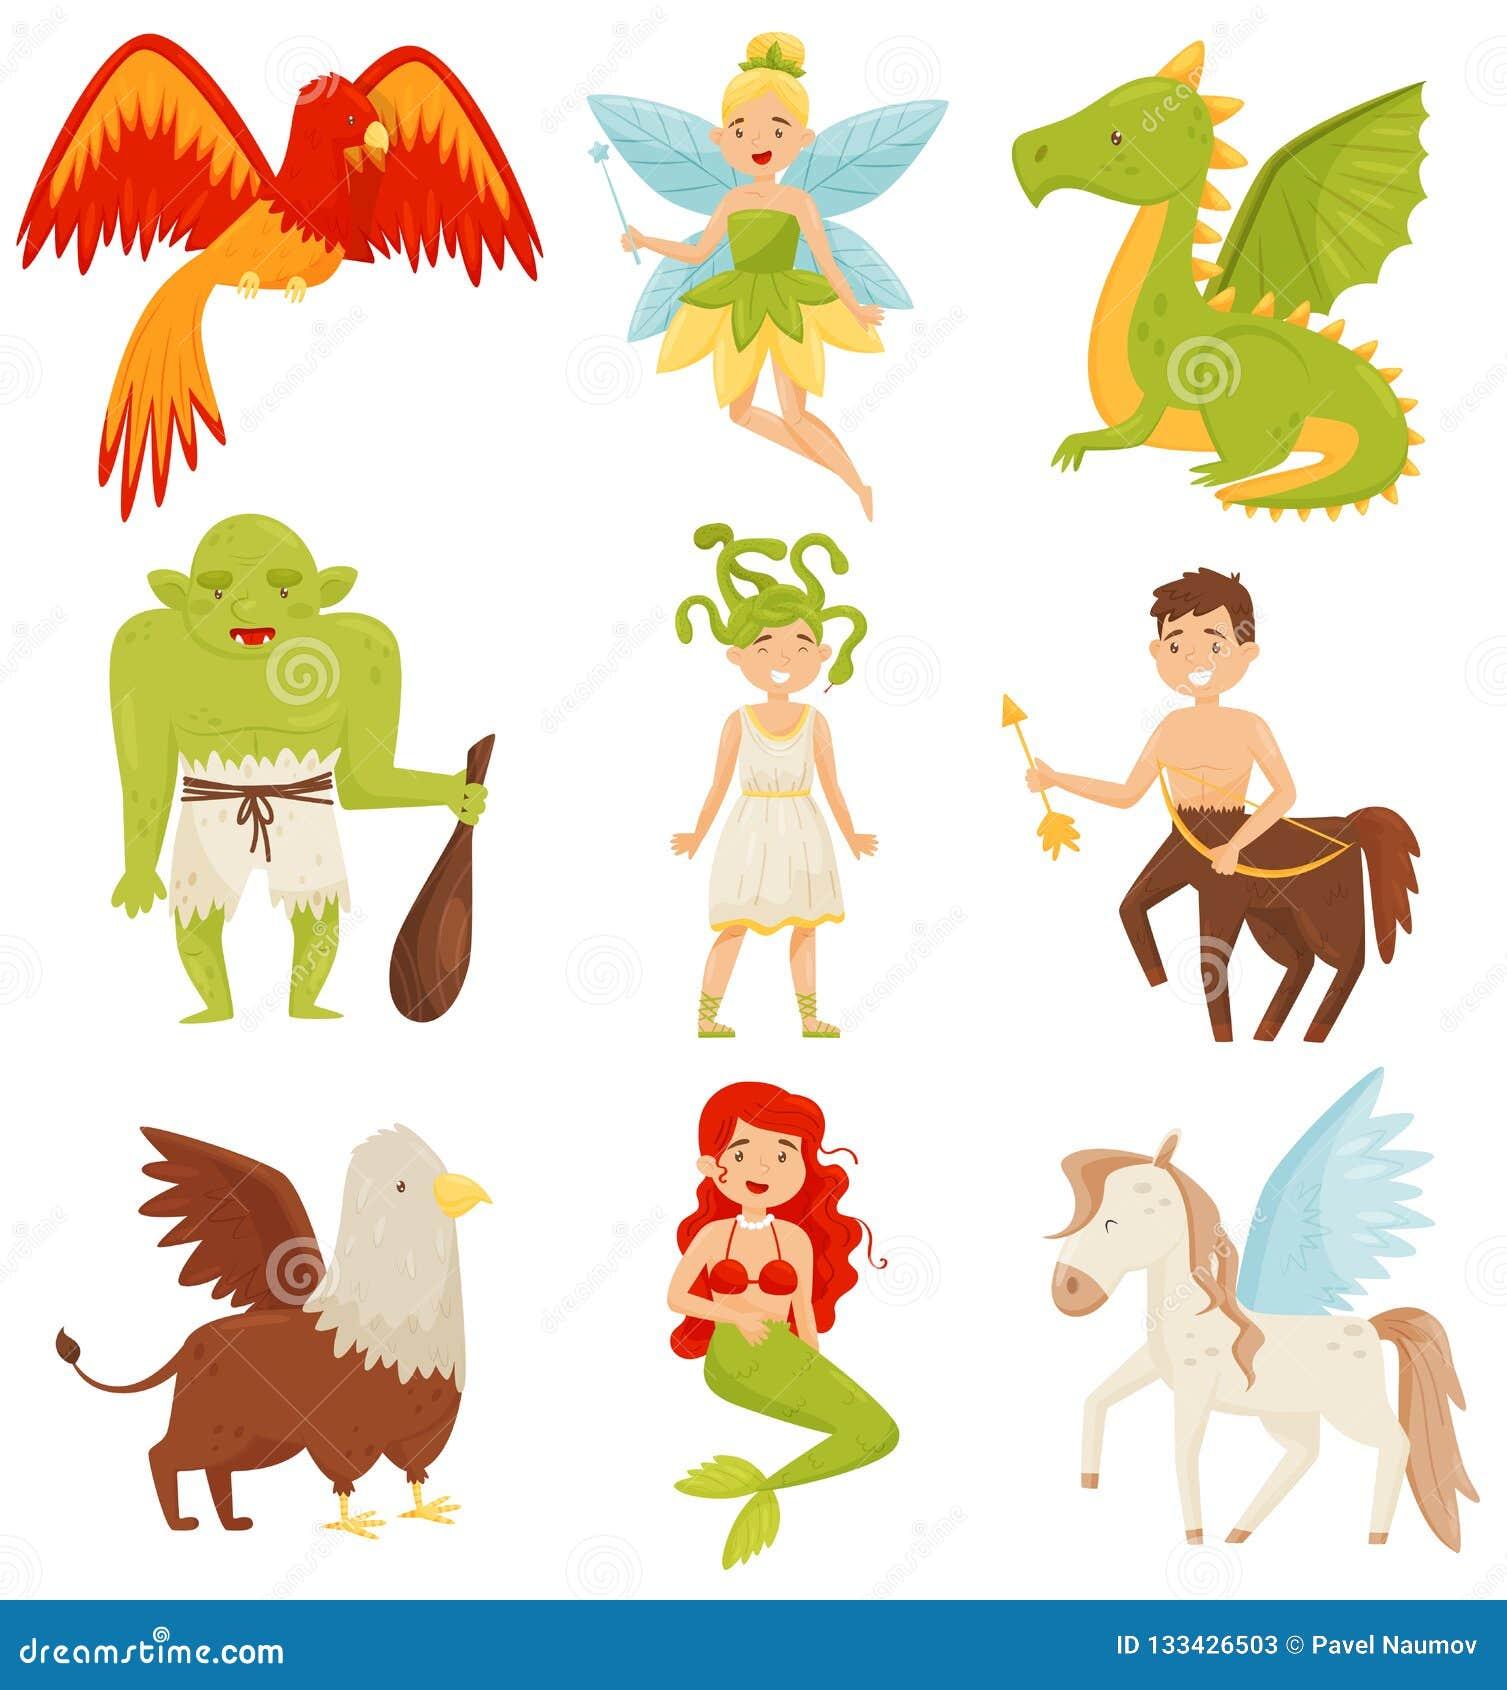 Mythical fairy tale creatures set, Centaur, Pegasus, Griffin, Medusa Gorgon, Mermaid, Dragon, Flaming Phoenix bird